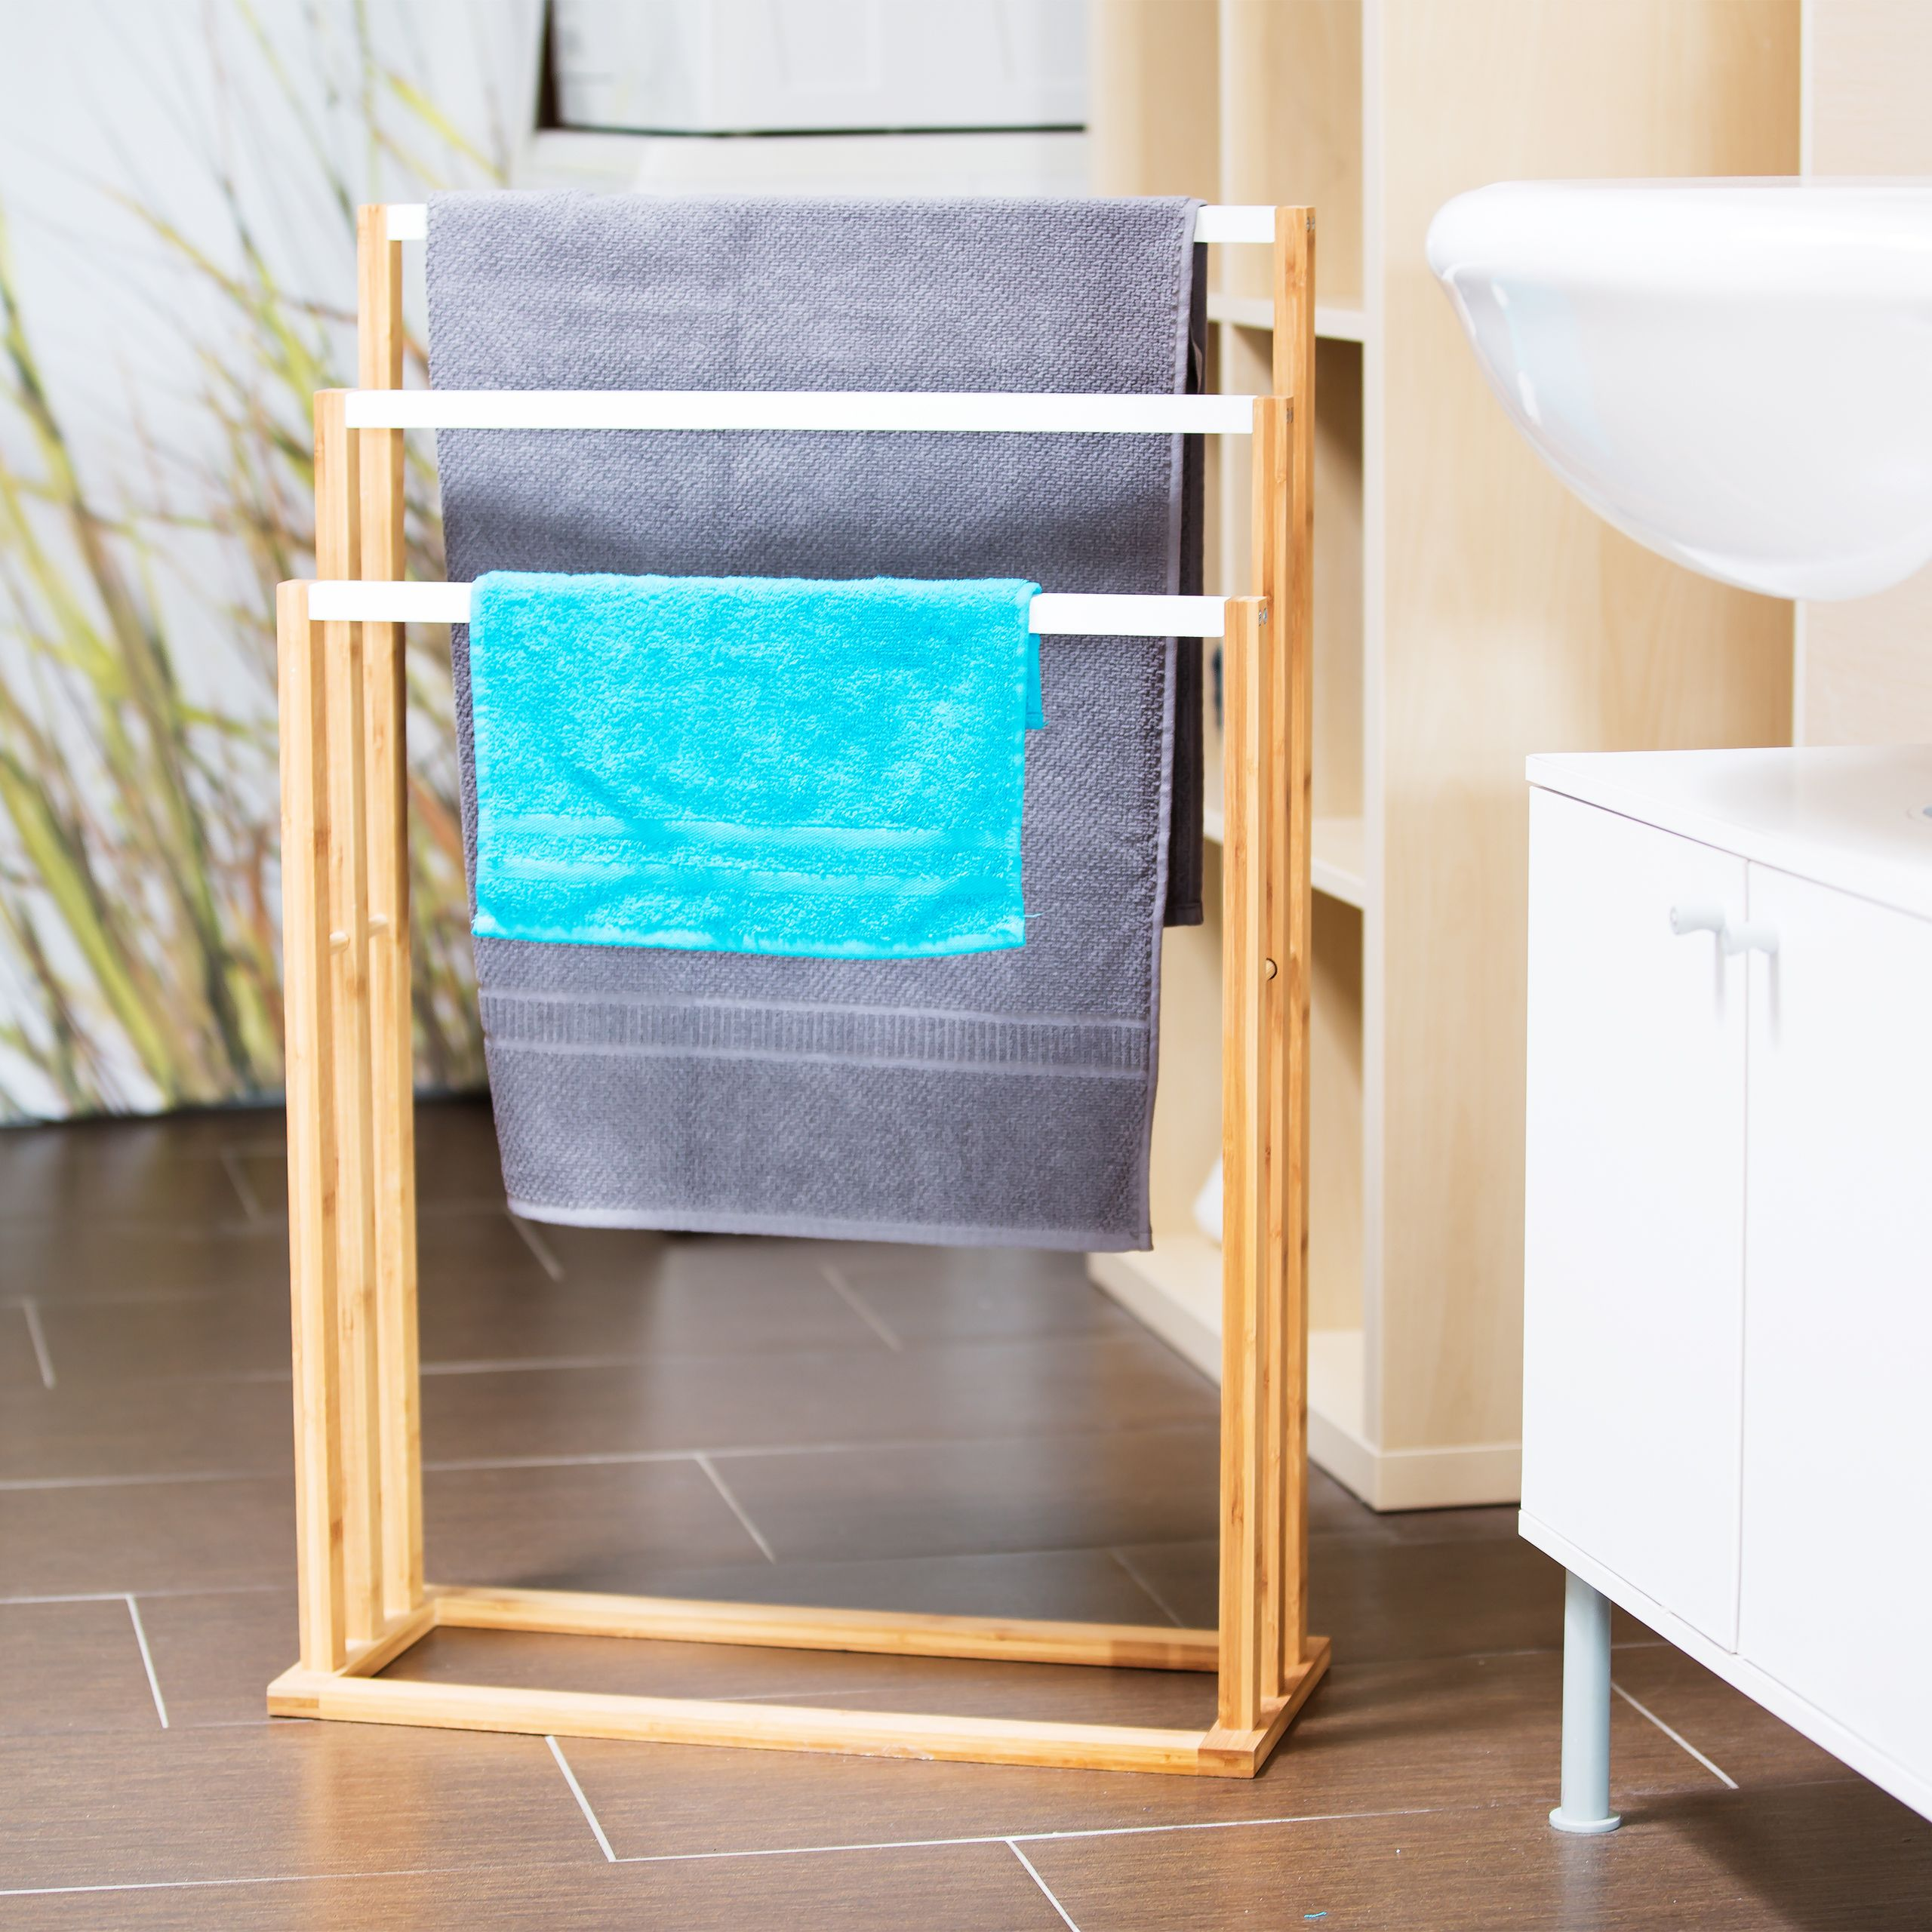 Bambus Handtuchhalter 3 Fach In 2020 Handtuchregal Handtuchhalter Handtuchstander